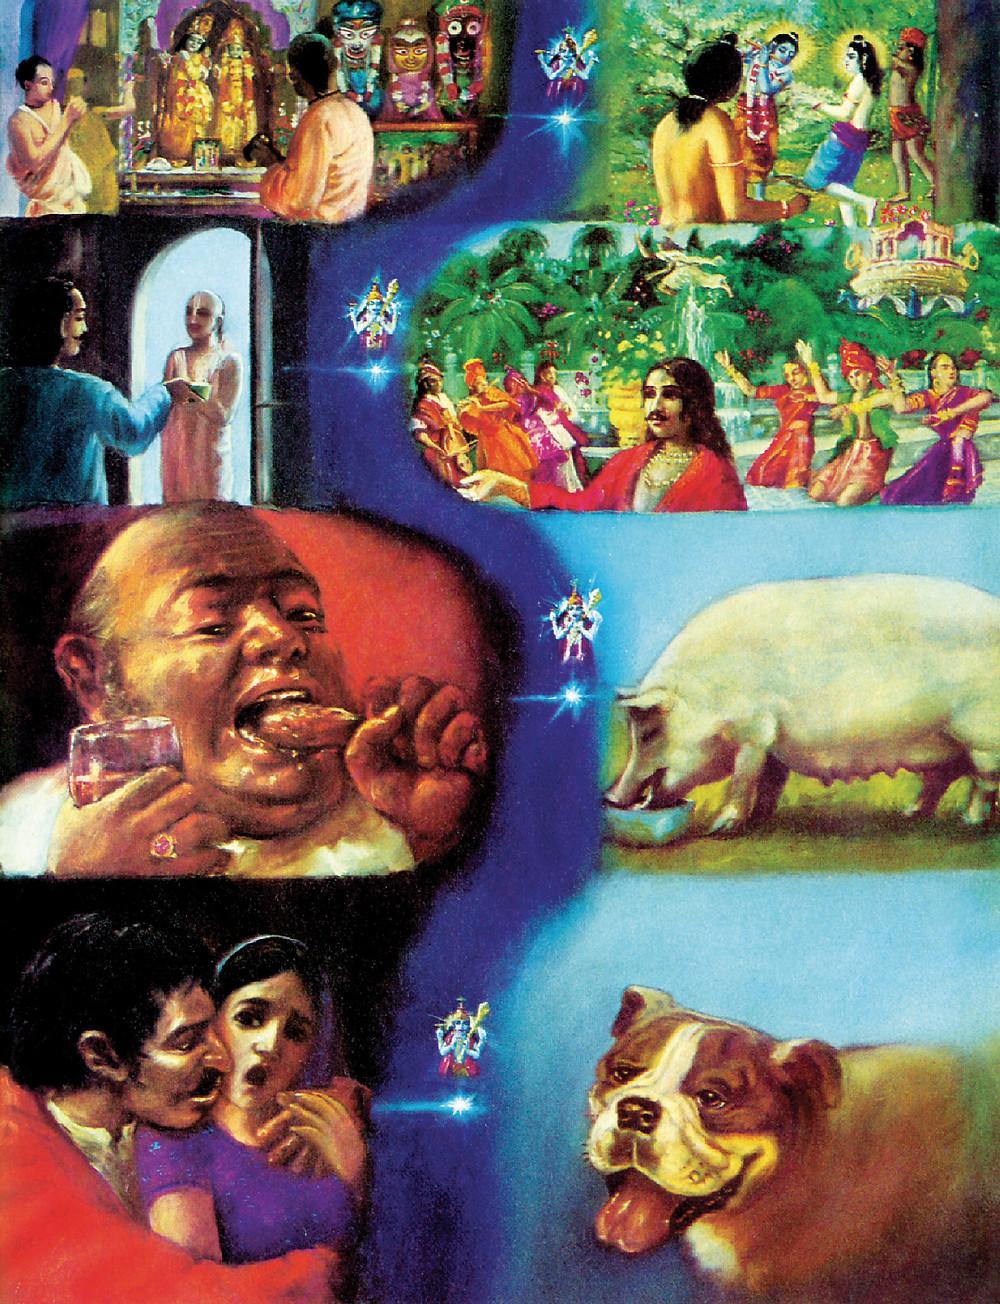 11-karma, reincarnation 108.jpg